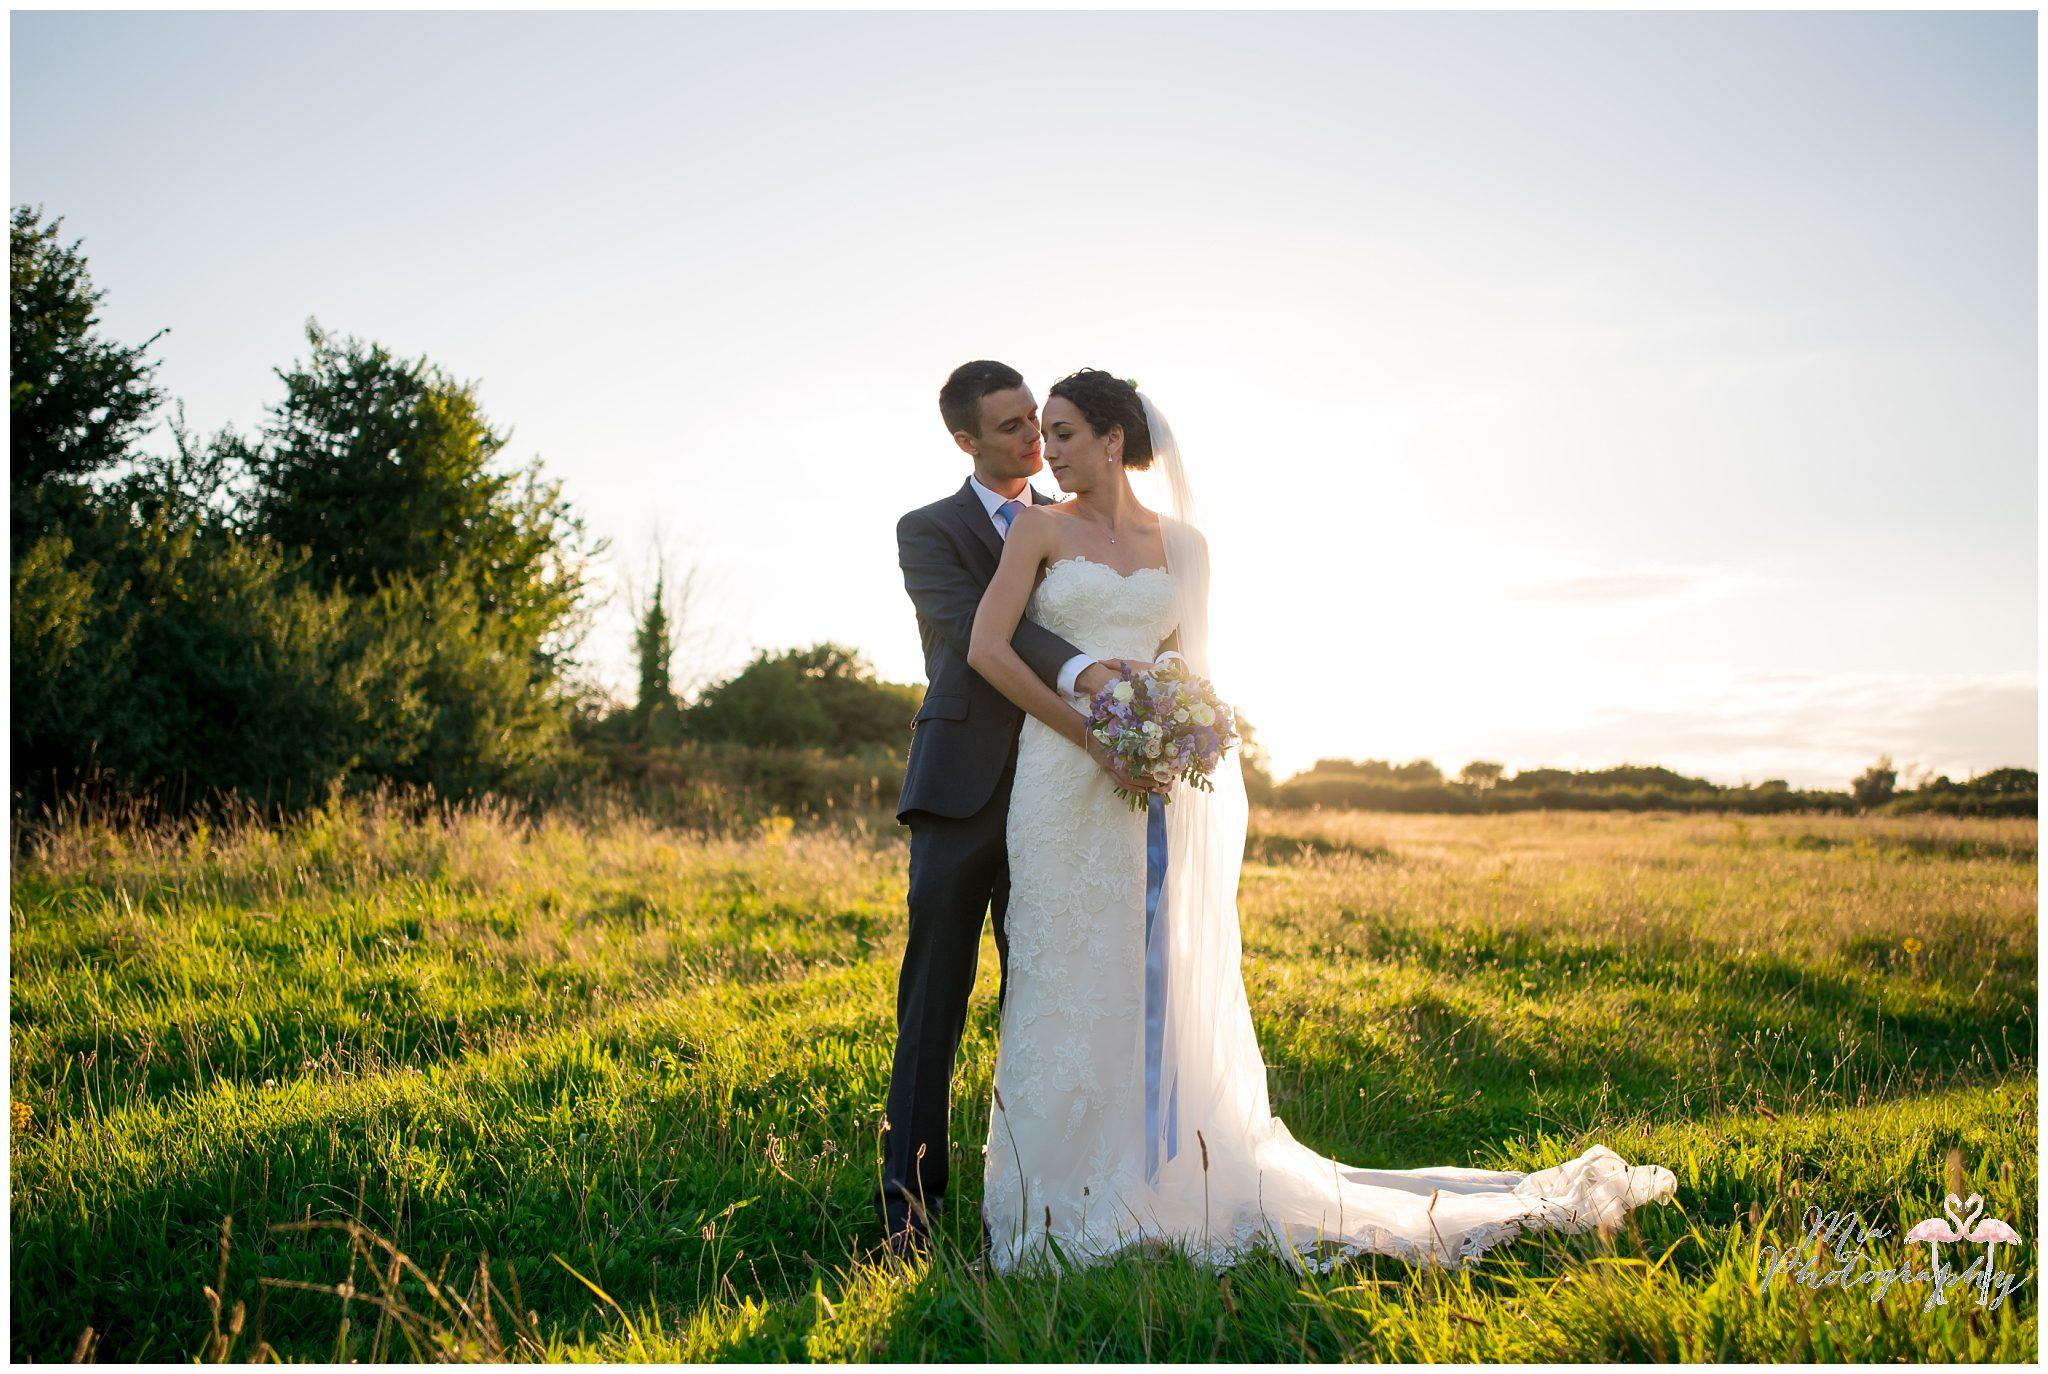 Hanger Farm wedding